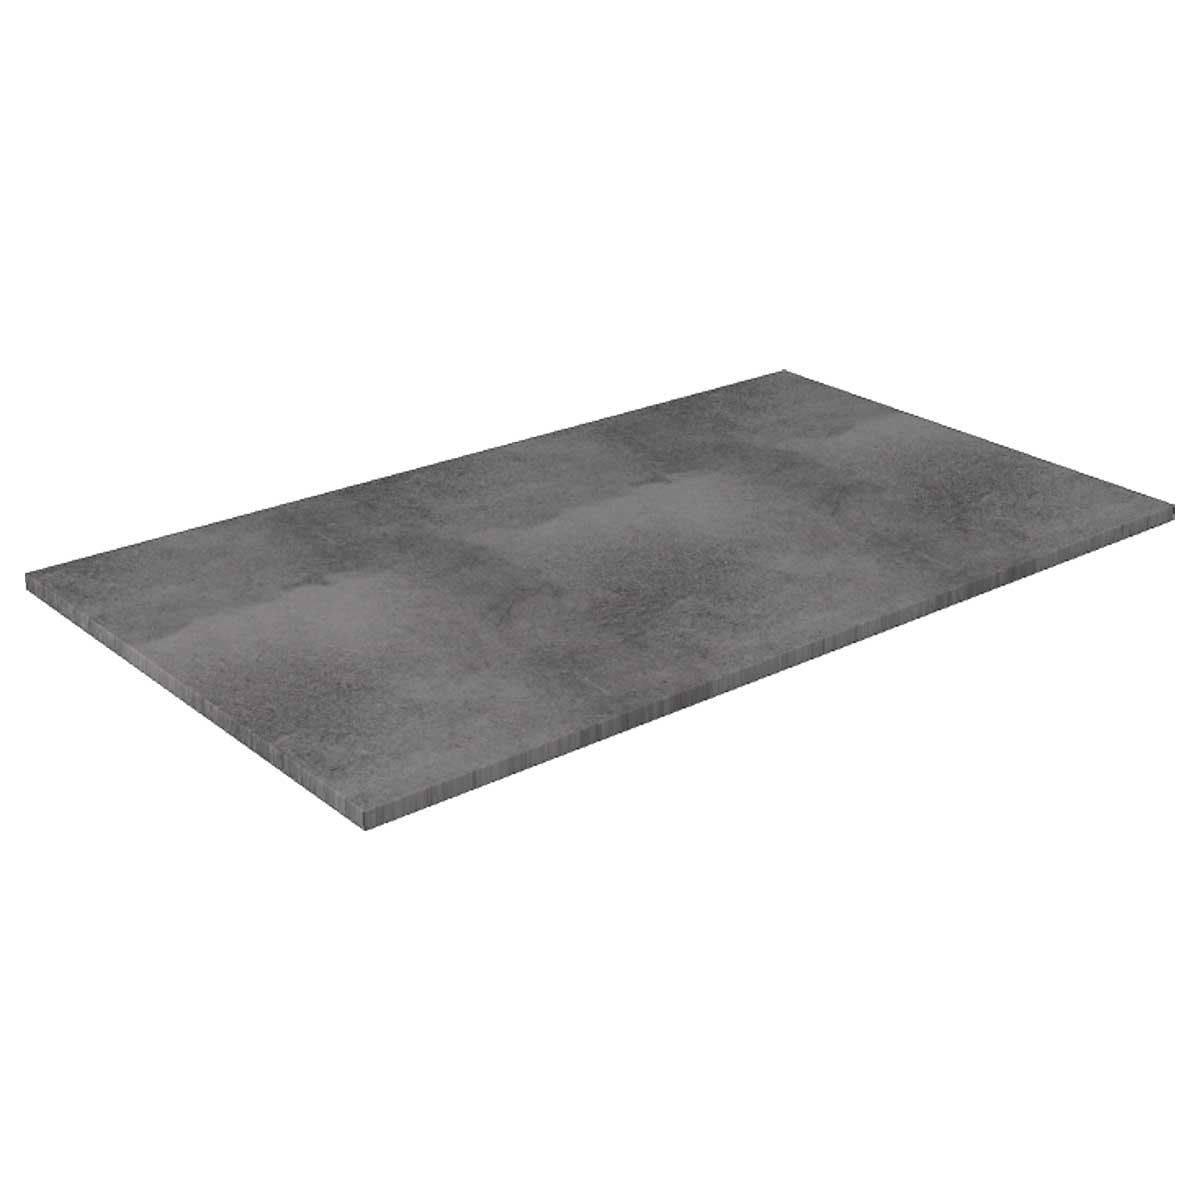 TICAM E120X70 3192 - https://www.werzalit.com/es/producto/tablero-cambium-e-120x70-cm-espesor-del-tablero-39cm-decor-dusseldorf/